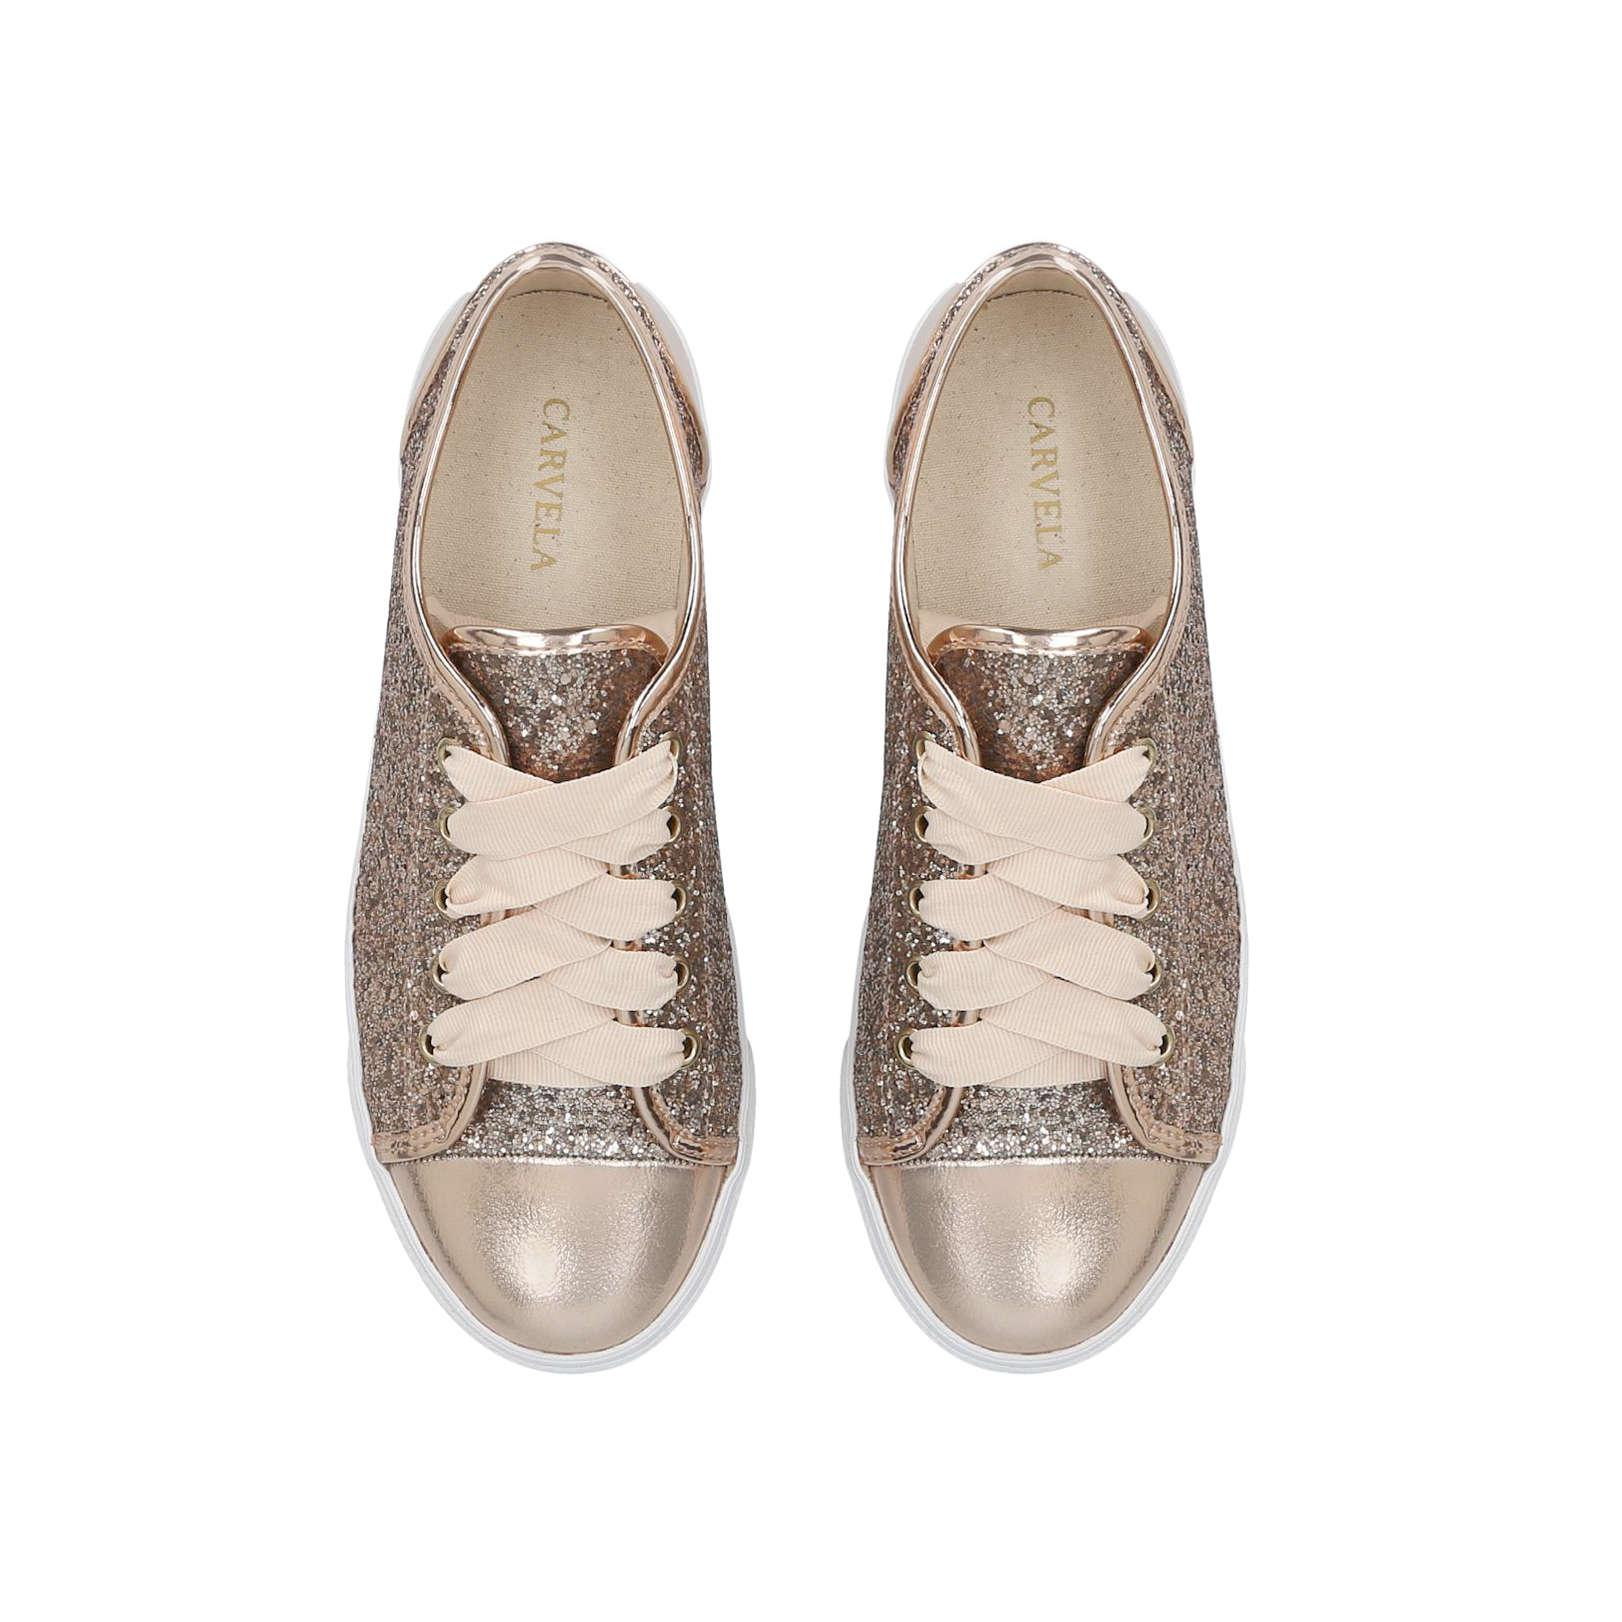 Carvela Kurt Geiger Jester Sneakers No